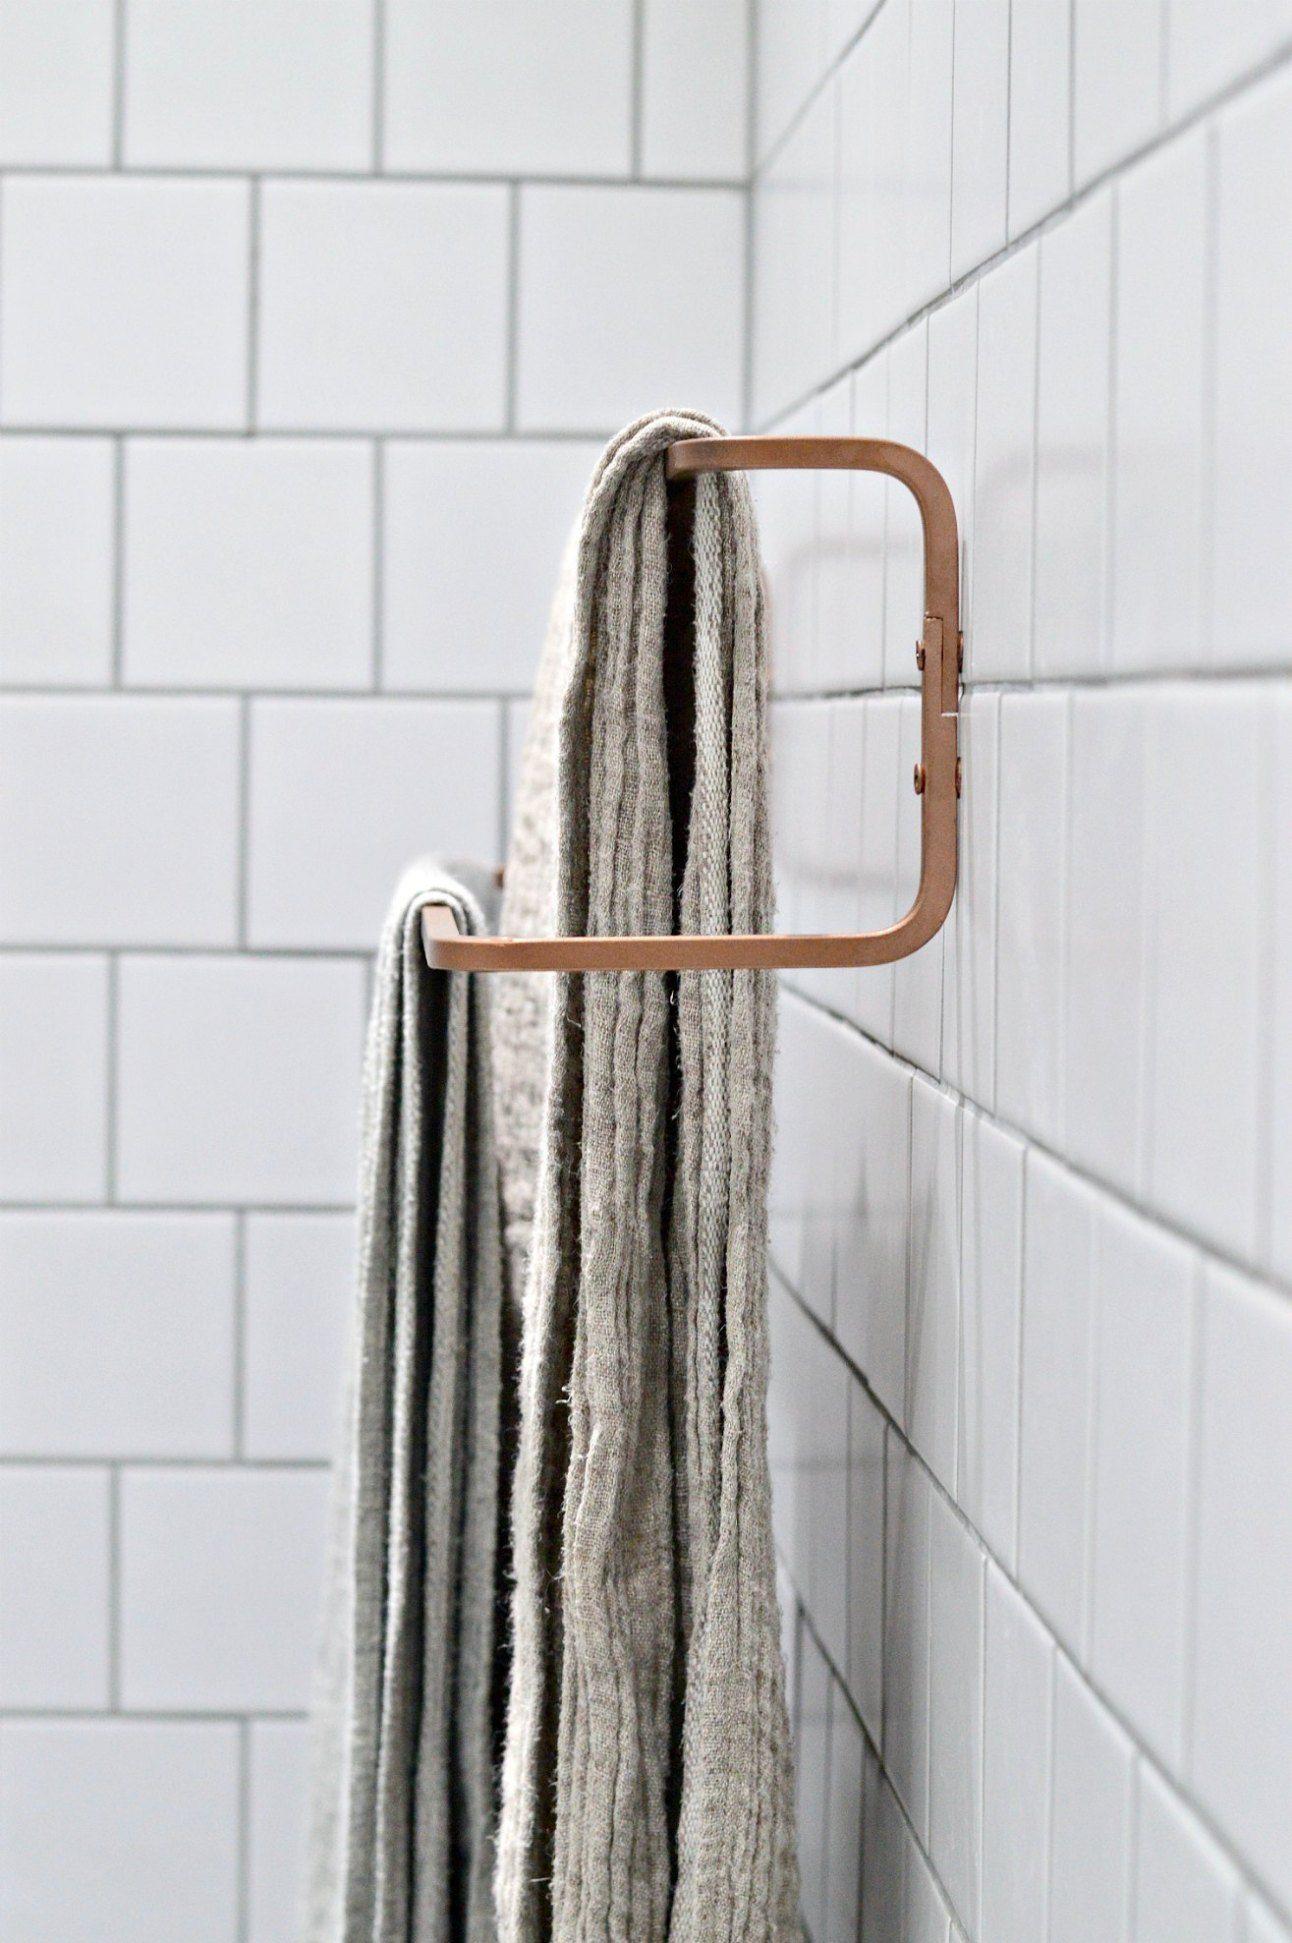 10 Minute Diy Ikea Towel Rail Hack Ikea Towels Ikea Towel Rail